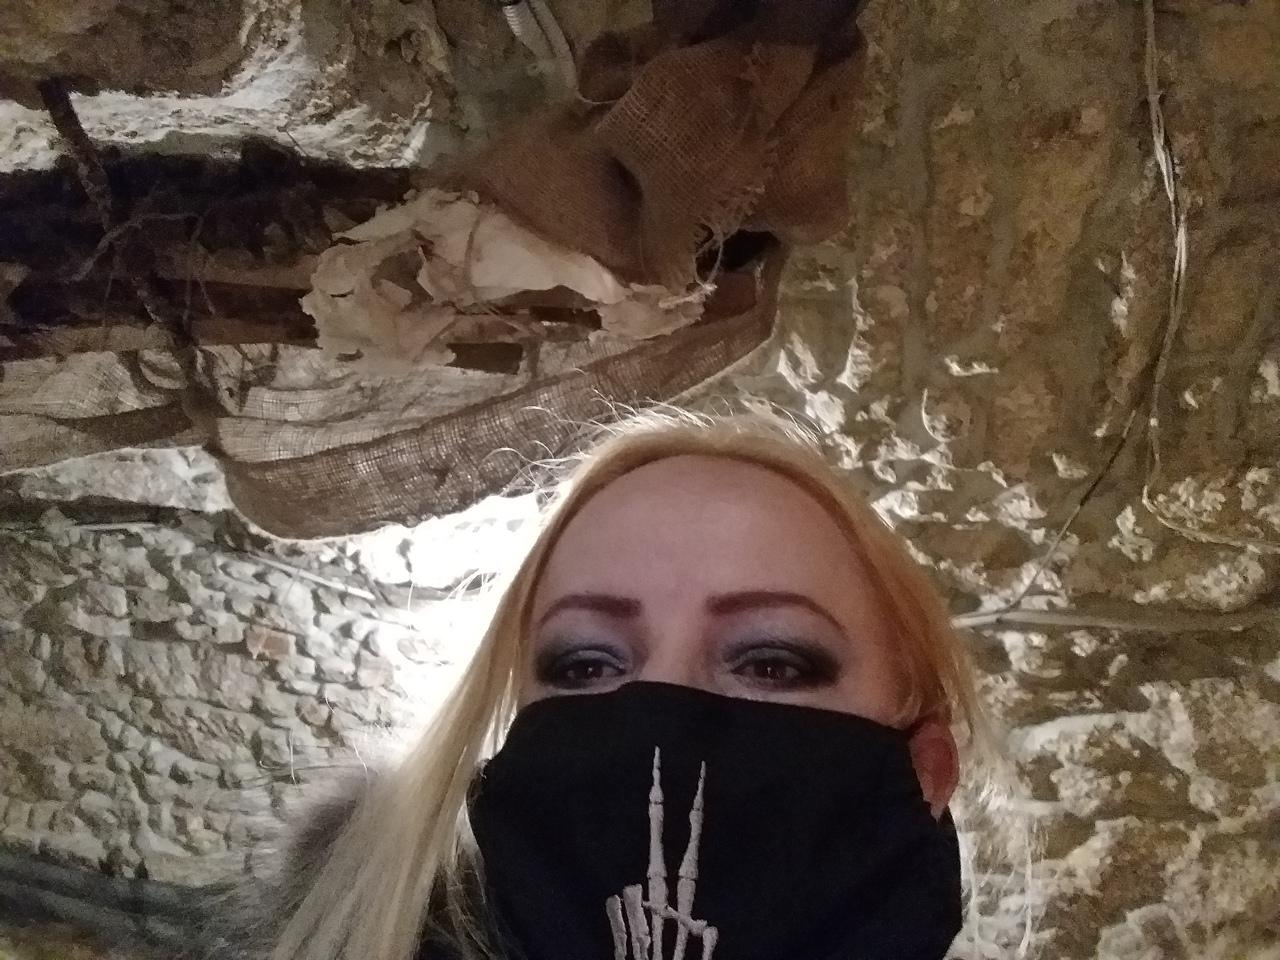 шриланкачерепашечьяферма - Елена Руденко. Мои путешествия (фото/видео) - Страница 4 NLKNqJcOQNU